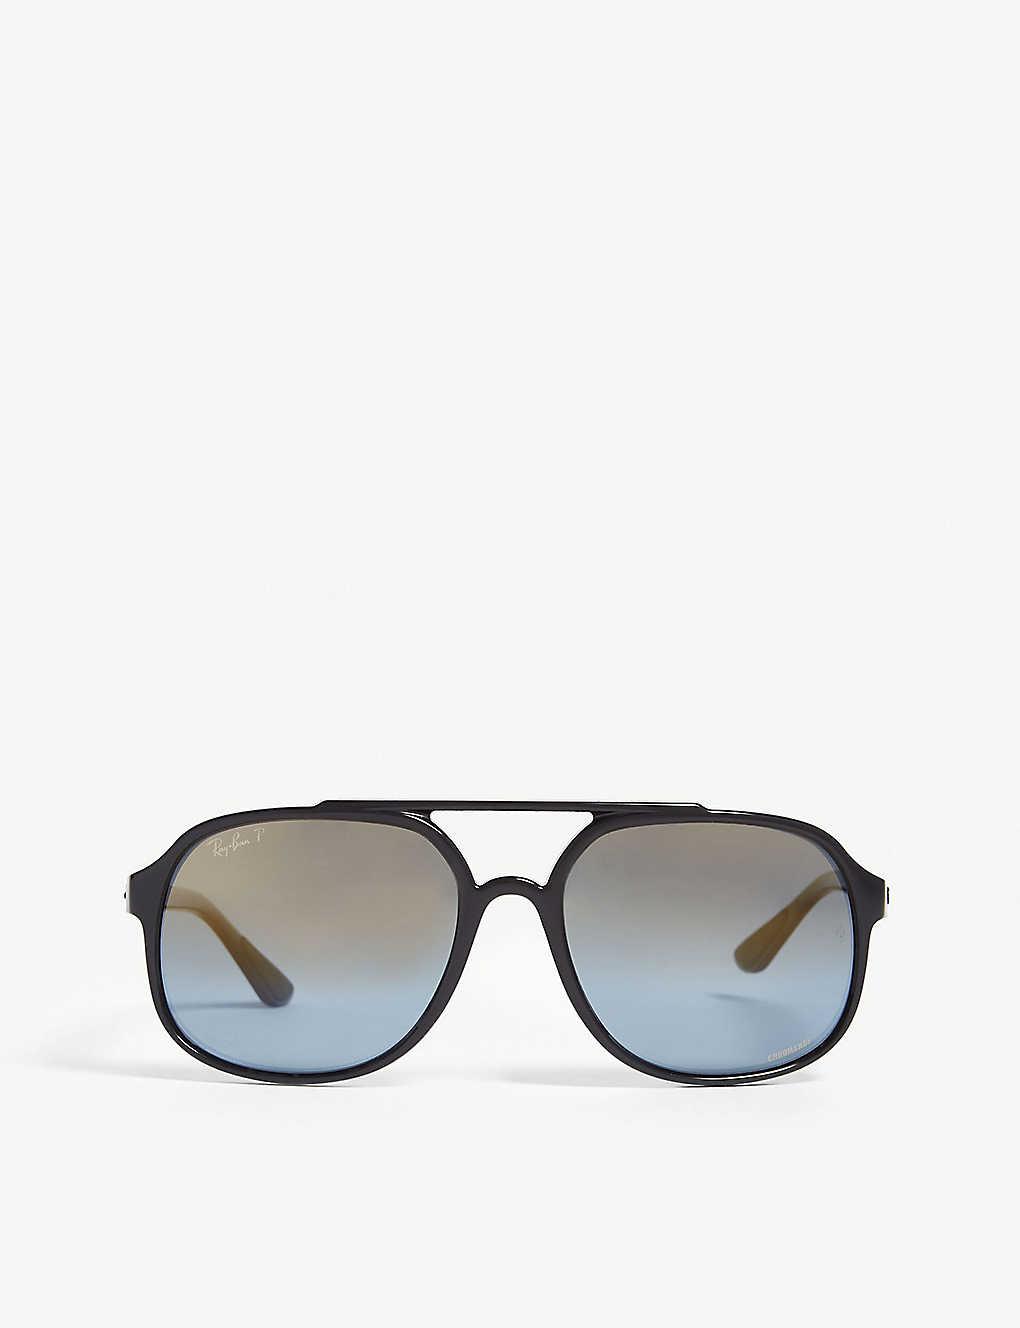 86e8f0d86c RAY-BAN - Square-frame nylon sunglasses